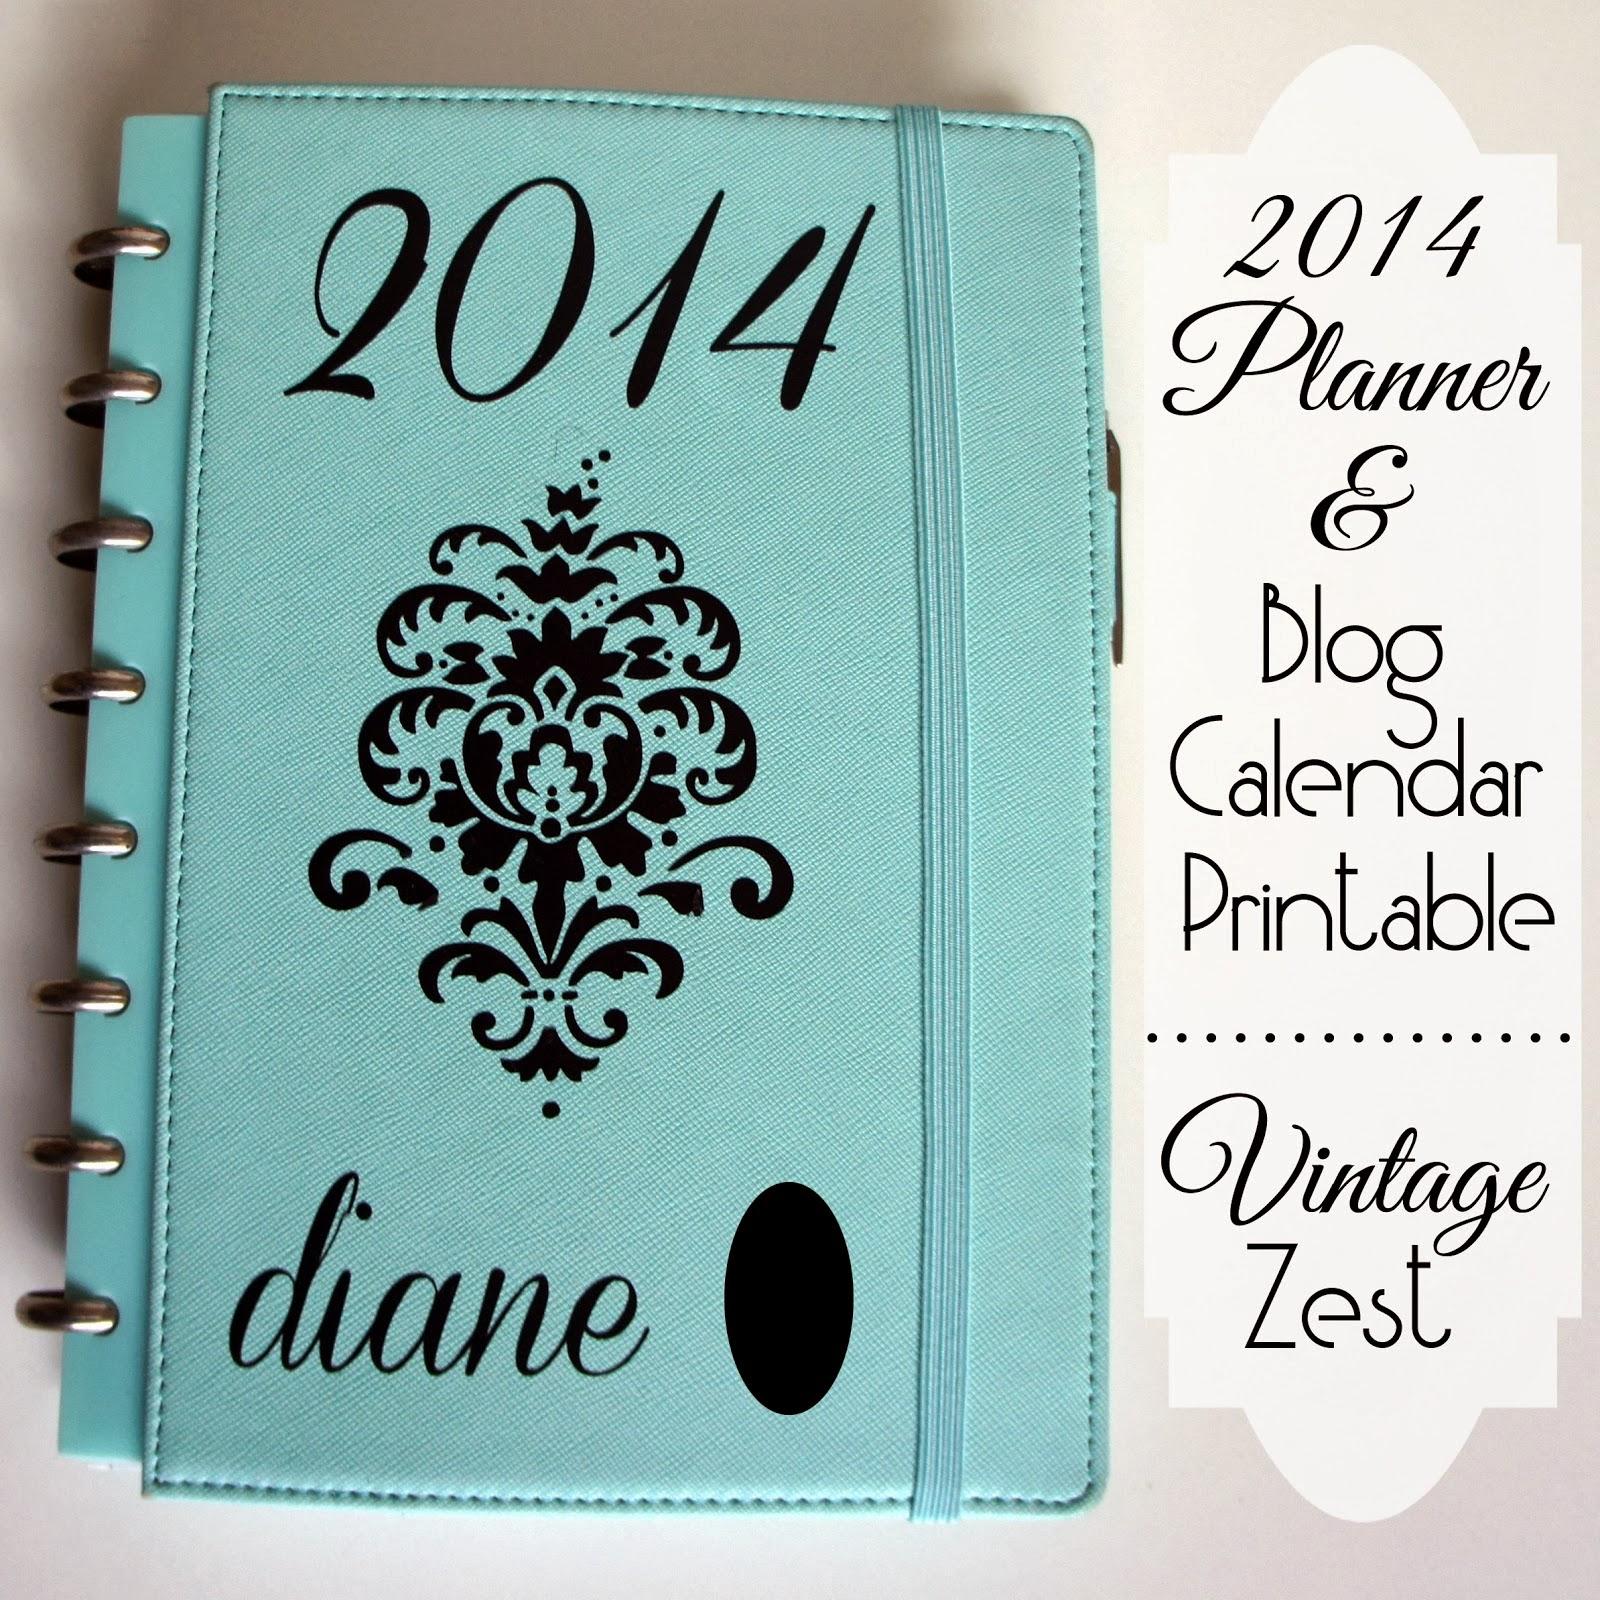 Free Printable Blog Planner Calendar Organizer